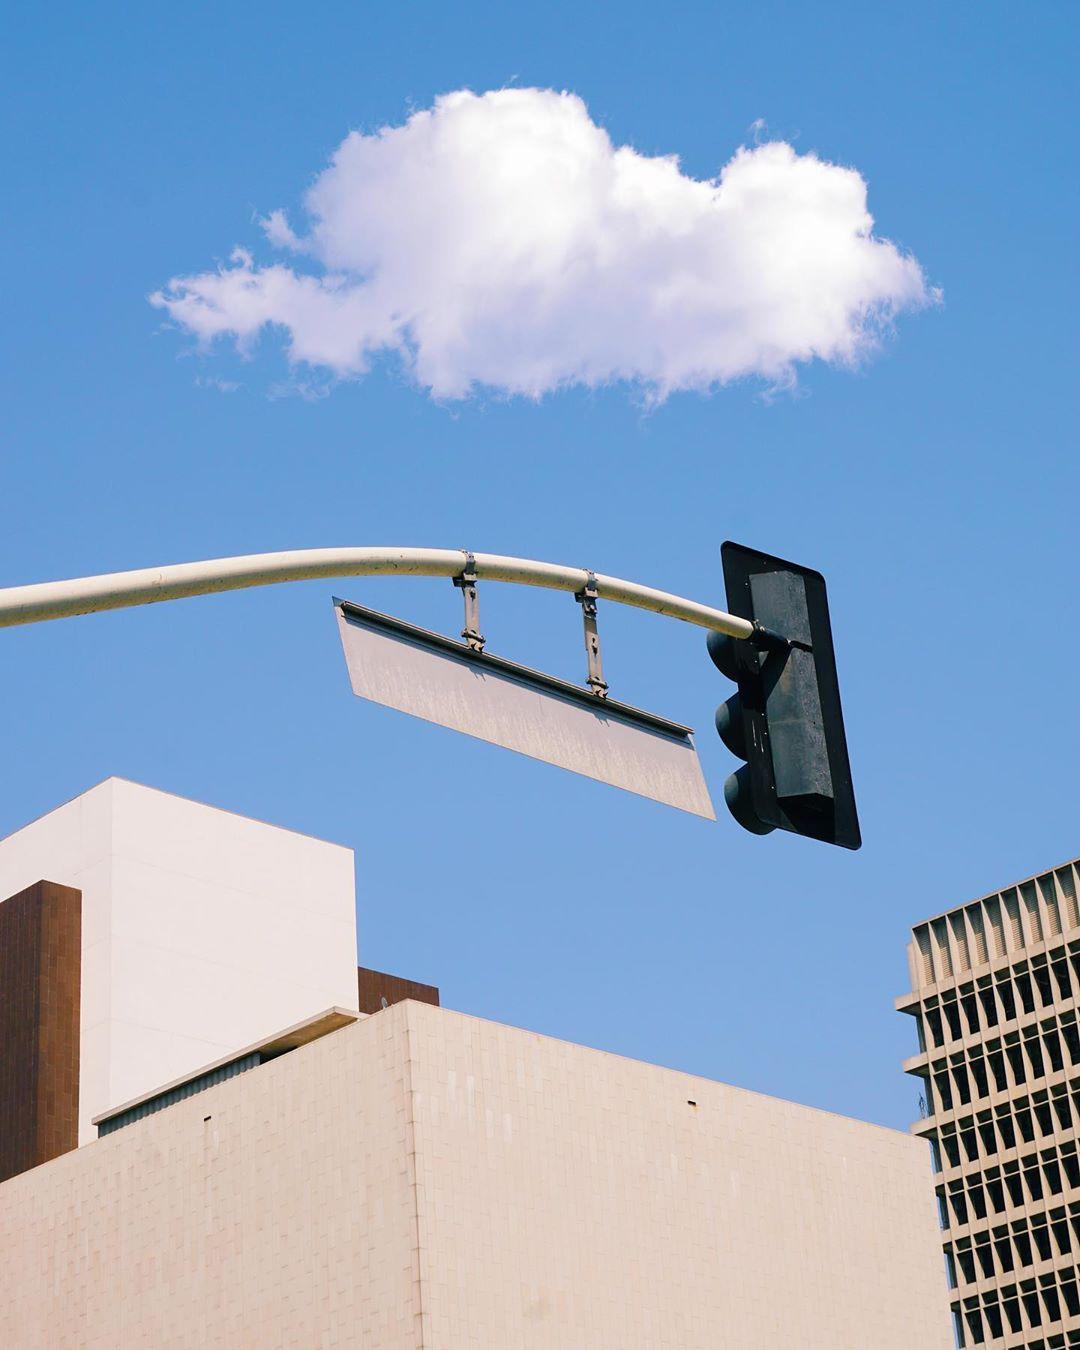 Los Angeles Semáforo. Foto: Rodrigo Autric